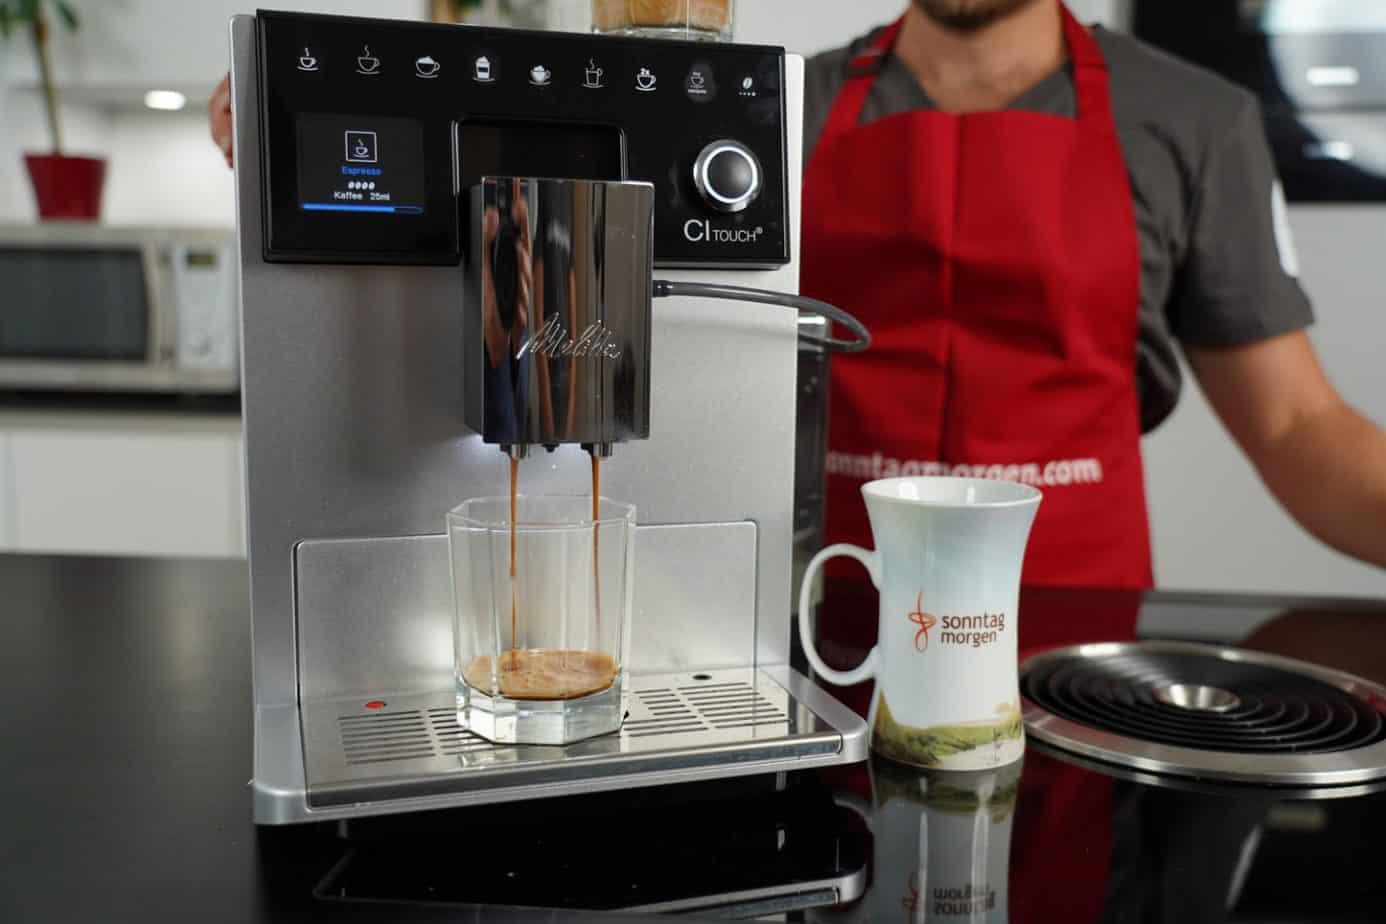 Melitta CI Touch Kaffeevollautomat im Test 2020: Innovatives Update oder Marketingschwindel?